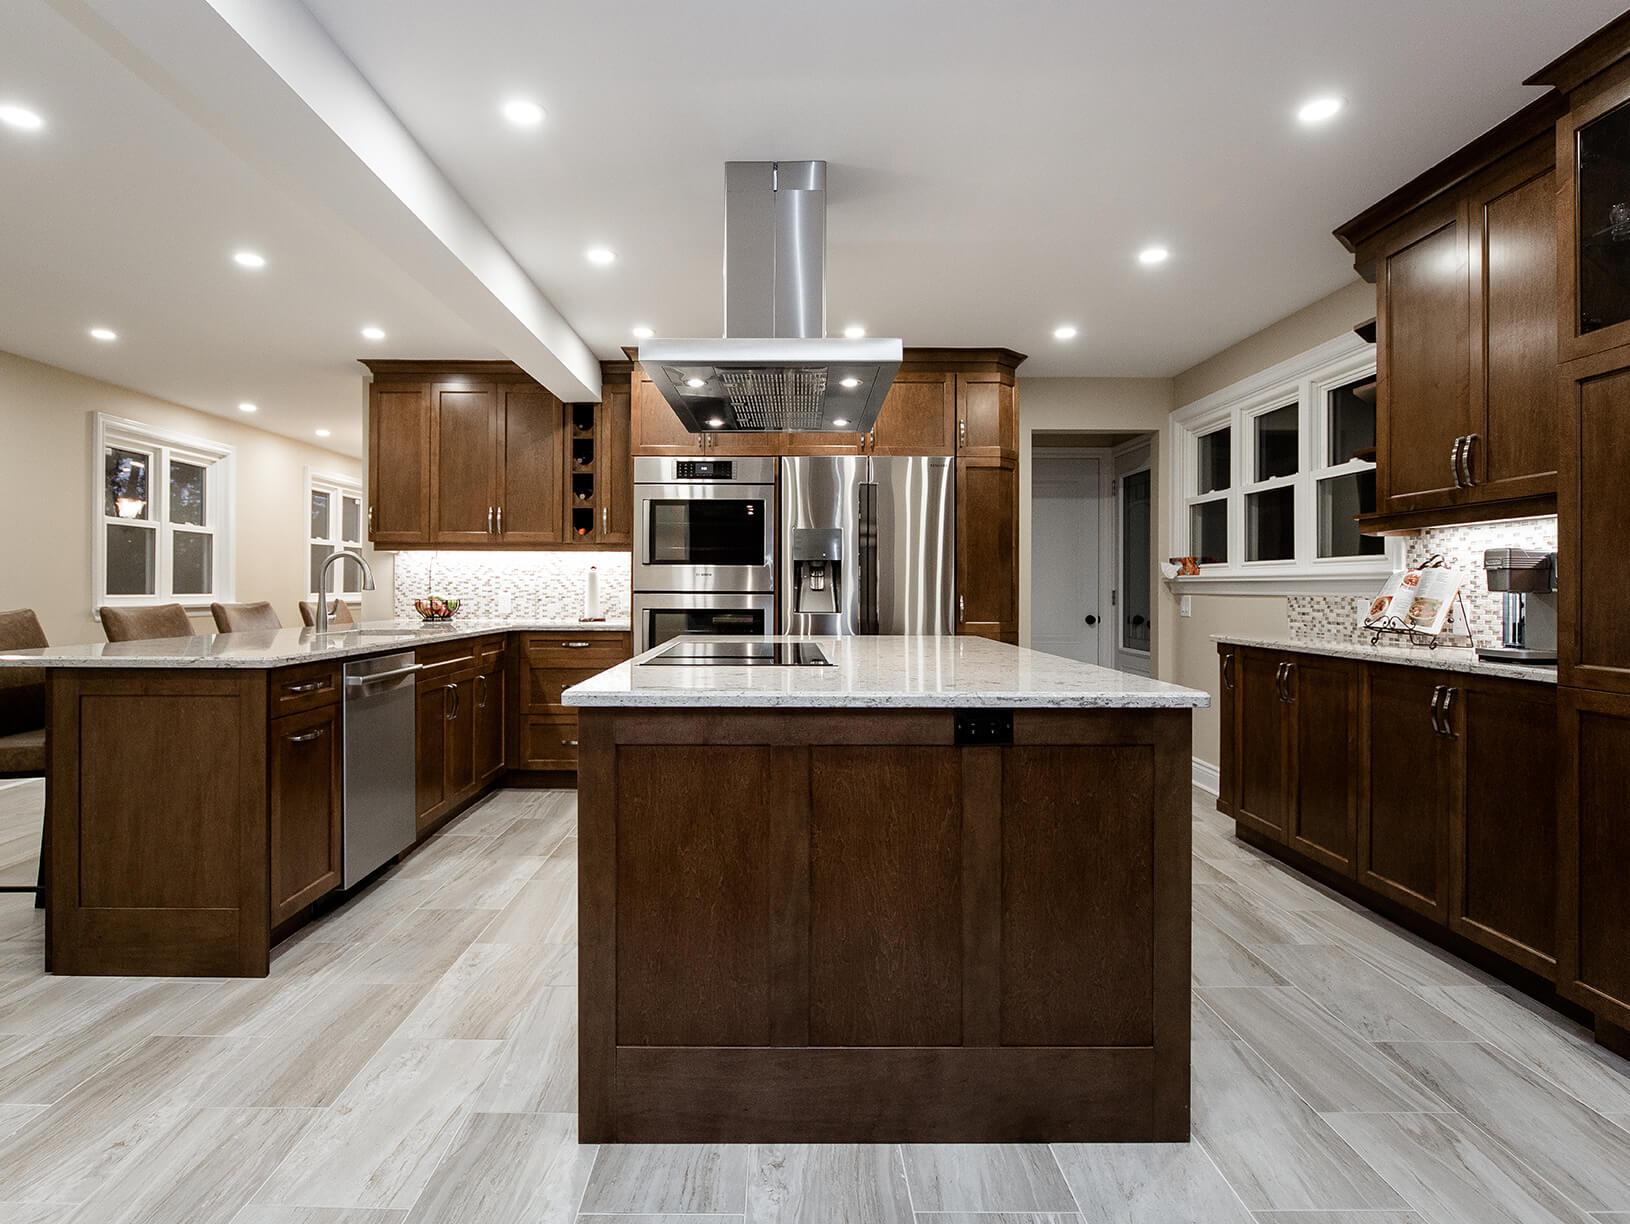 home - westend bath and kitchen